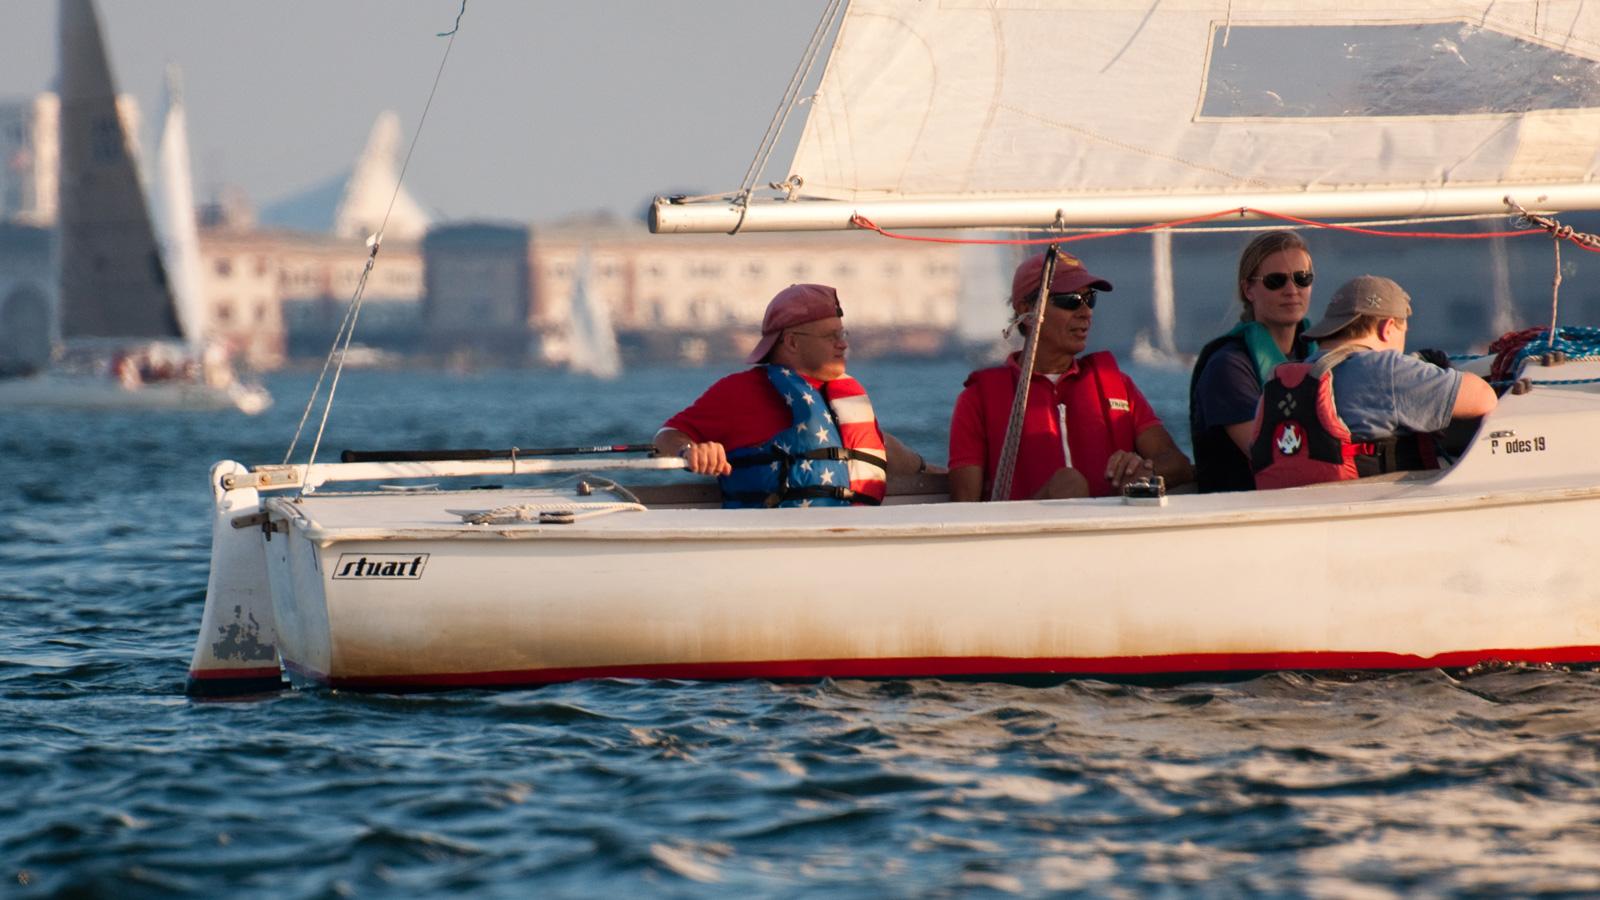 Special Olympics Massachusetts SOMA